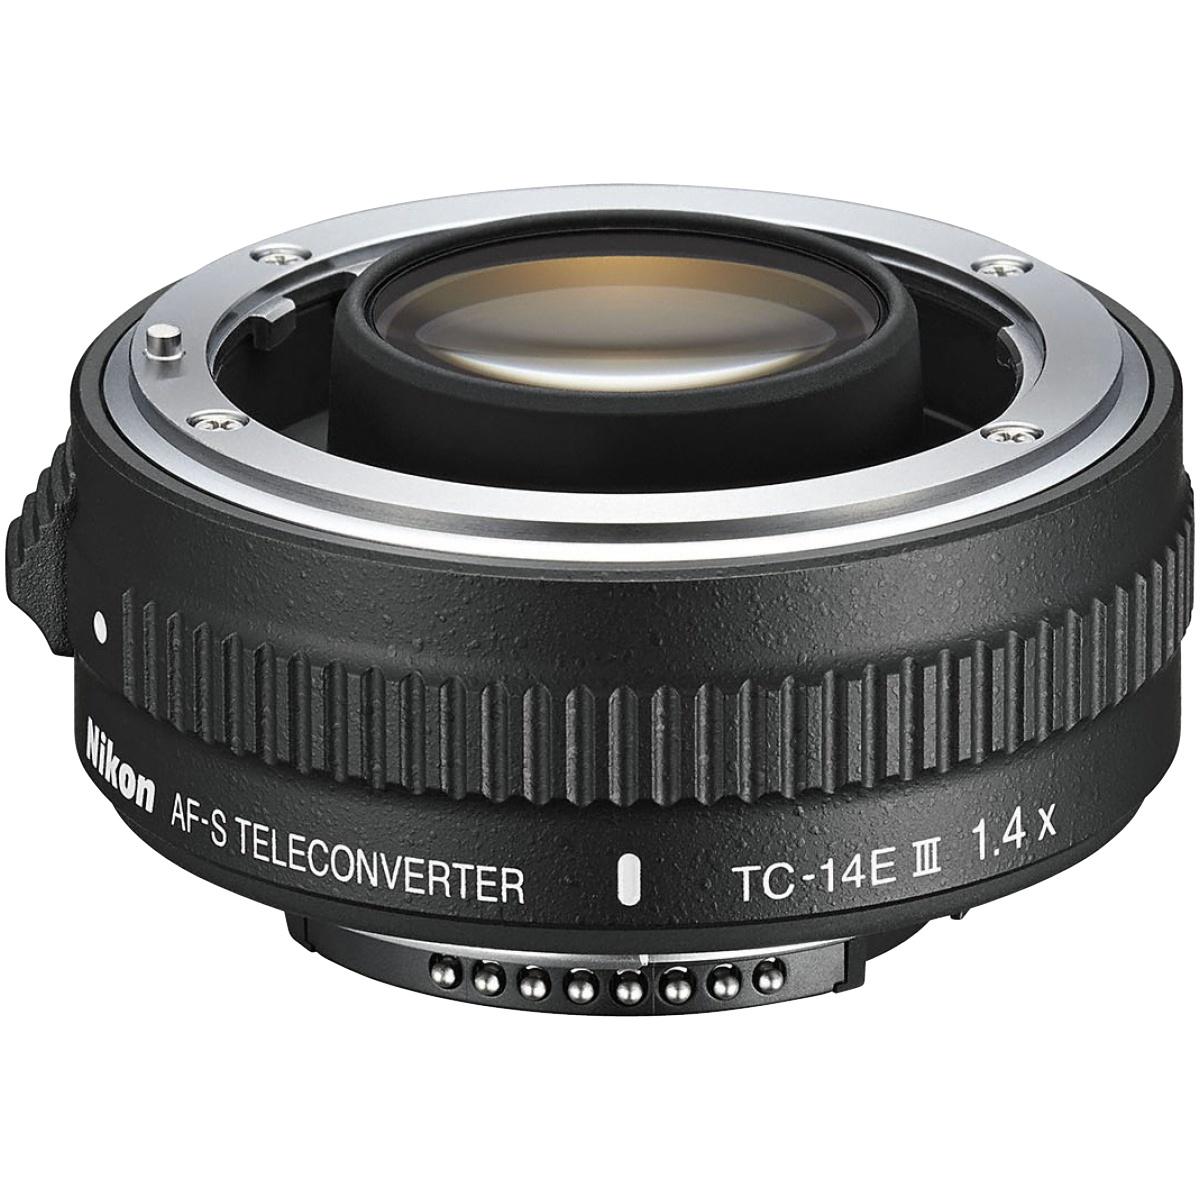 Nikon TC-14E III AF-S Telekonverter